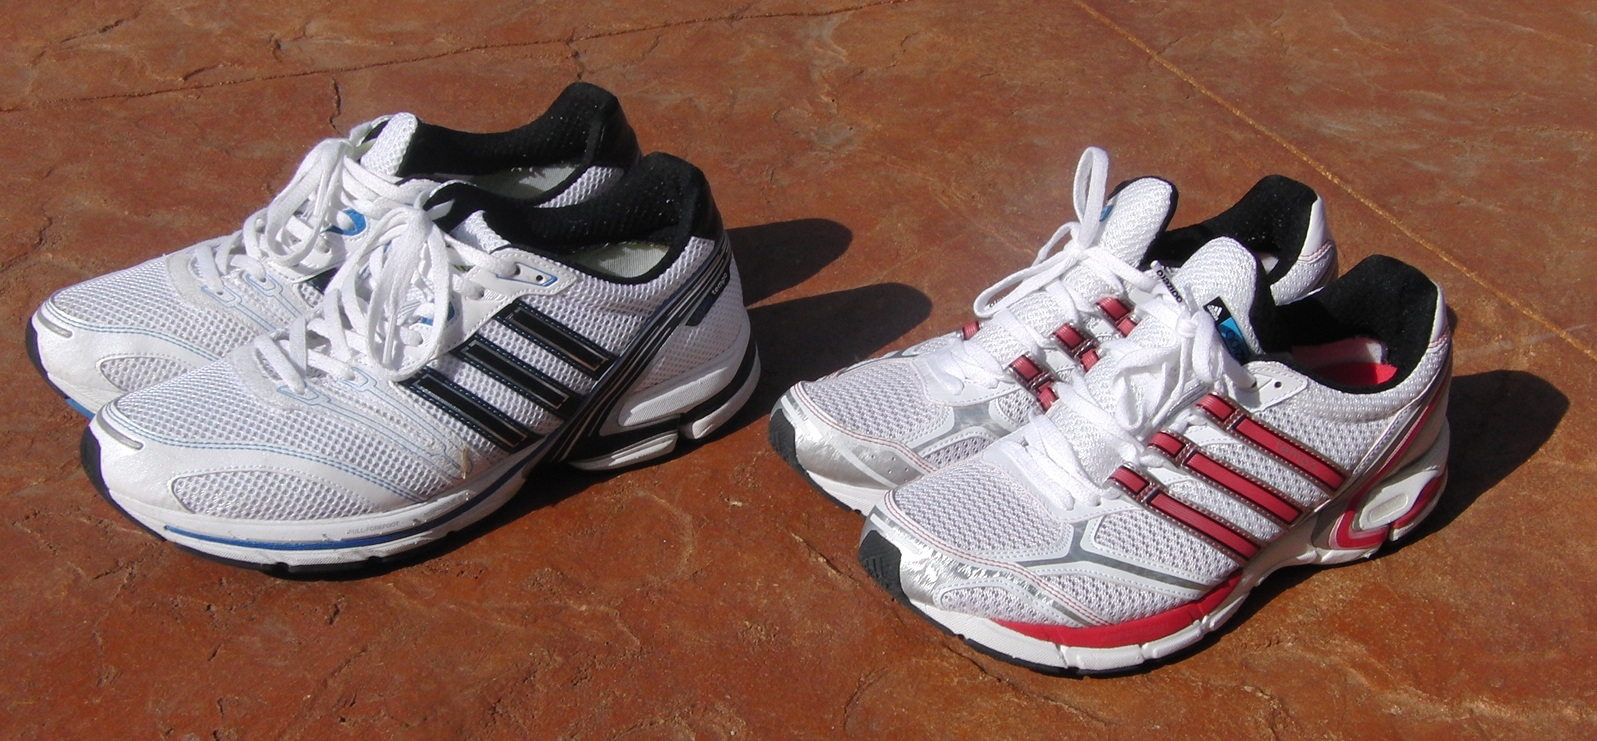 ShoeSoccer Adidas Cleats Running Adizero 101 T1KclJuF3